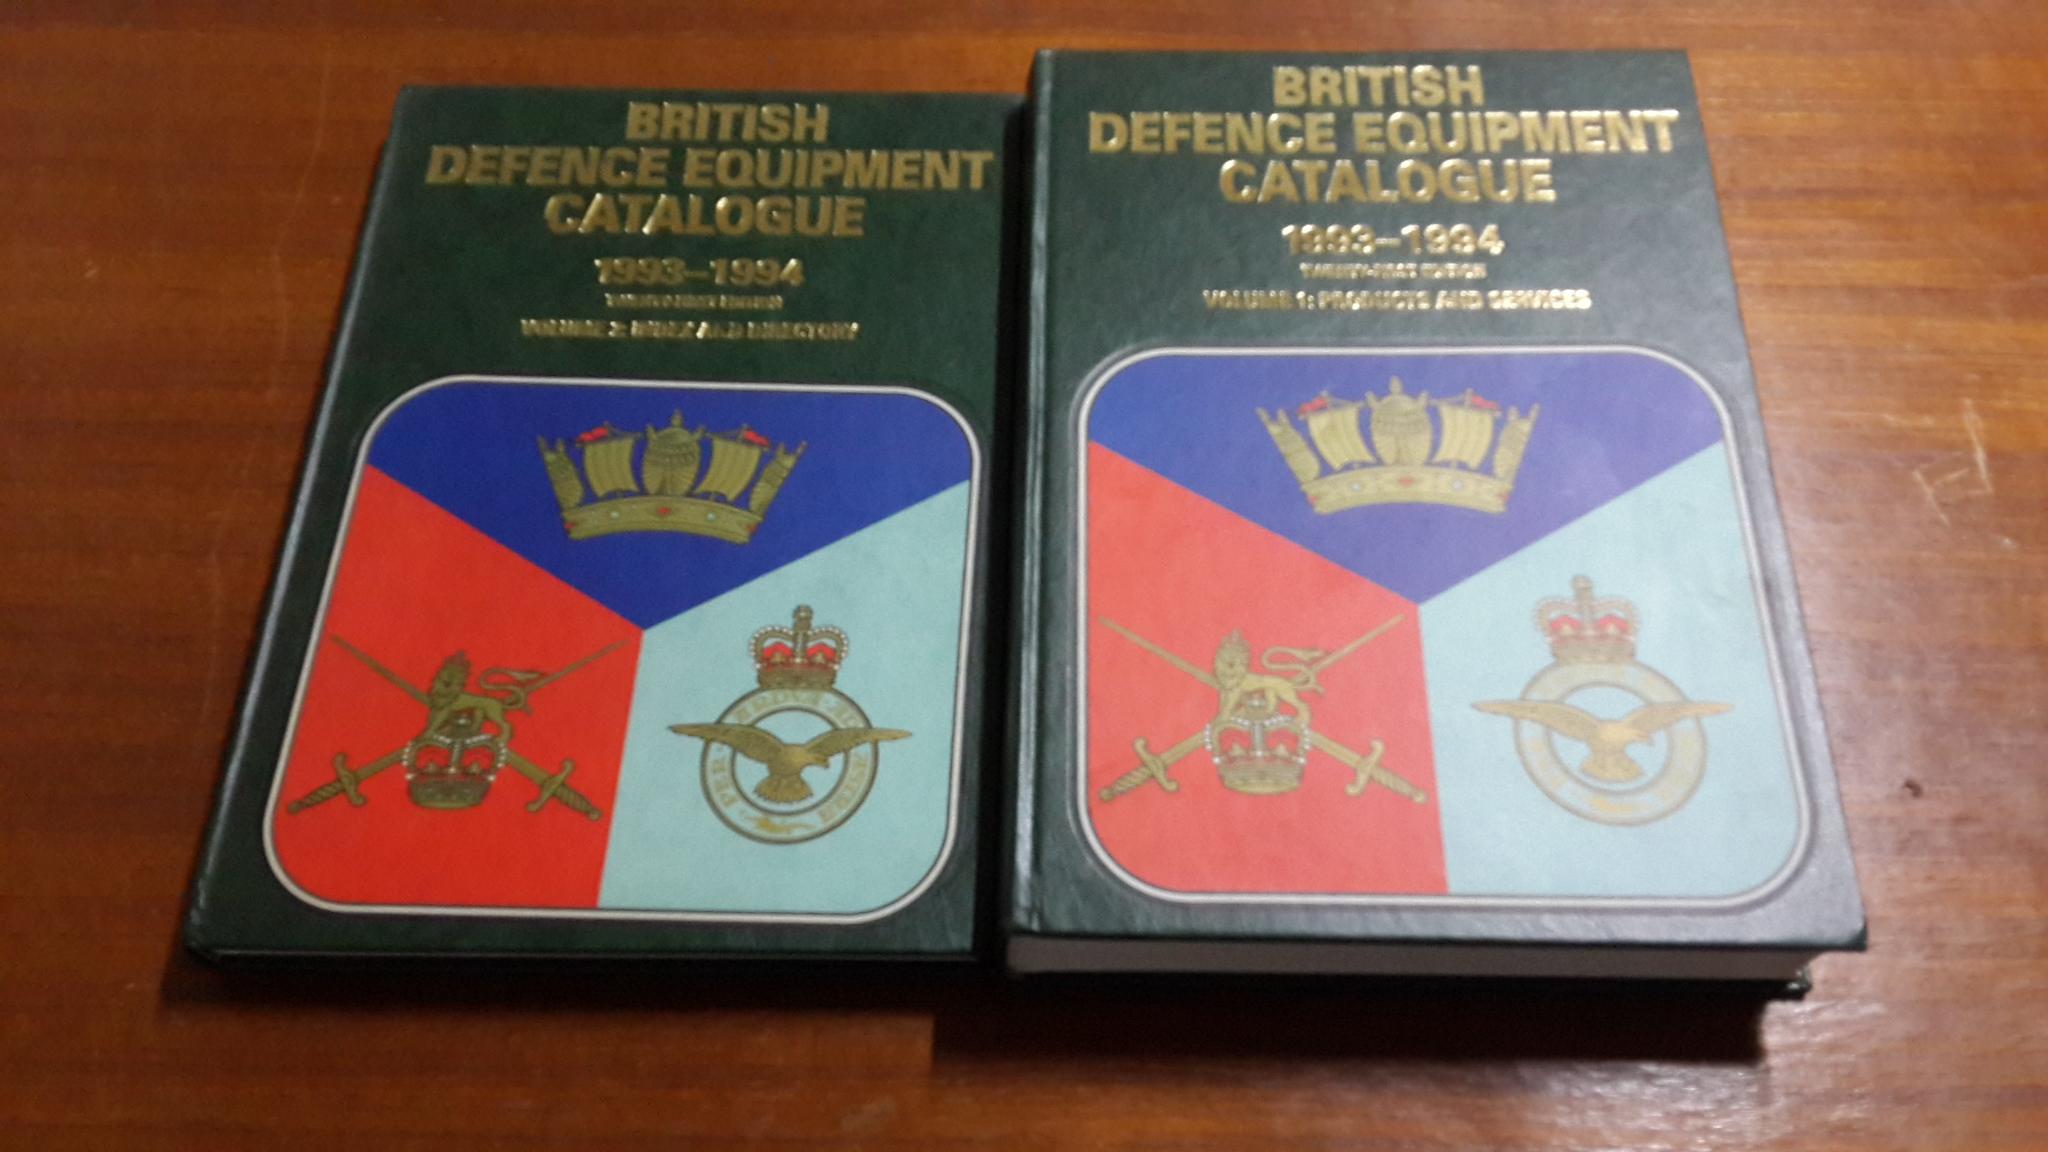 BRITISH DEFENCE EQUIPMENT CATALOGUE 1993-1994 TWENTY-FIRST EDITION : VOLUME 1-2